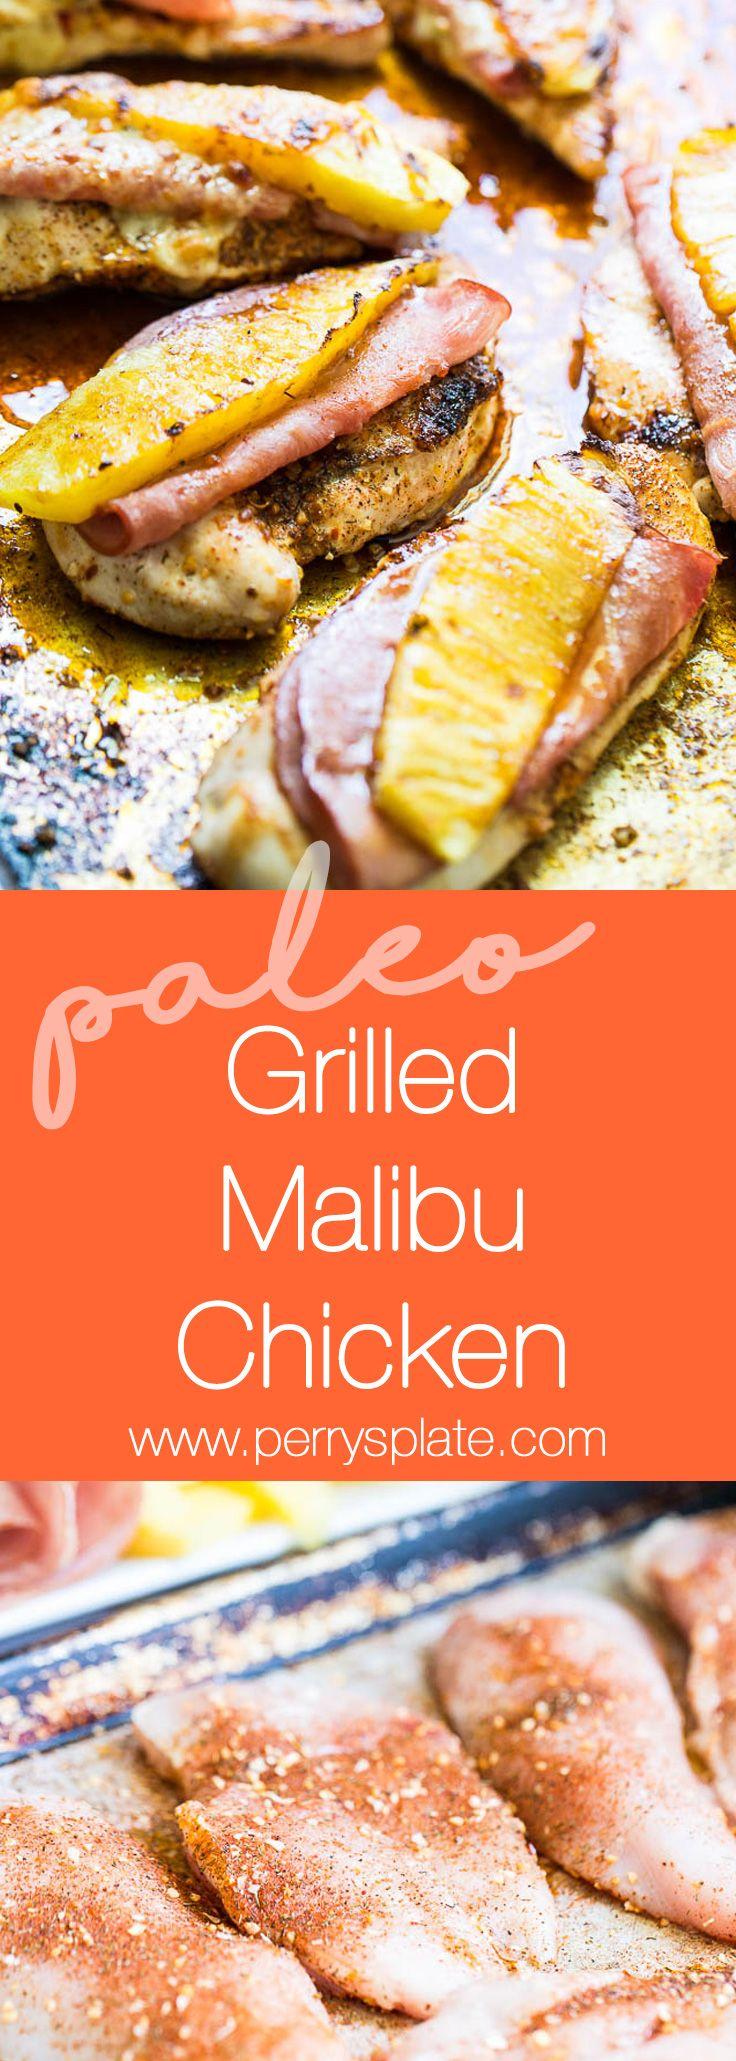 Paleo Grilled Malibu | Grilling recipes | chicken recipes | pineapple recipes | perrysplate.com